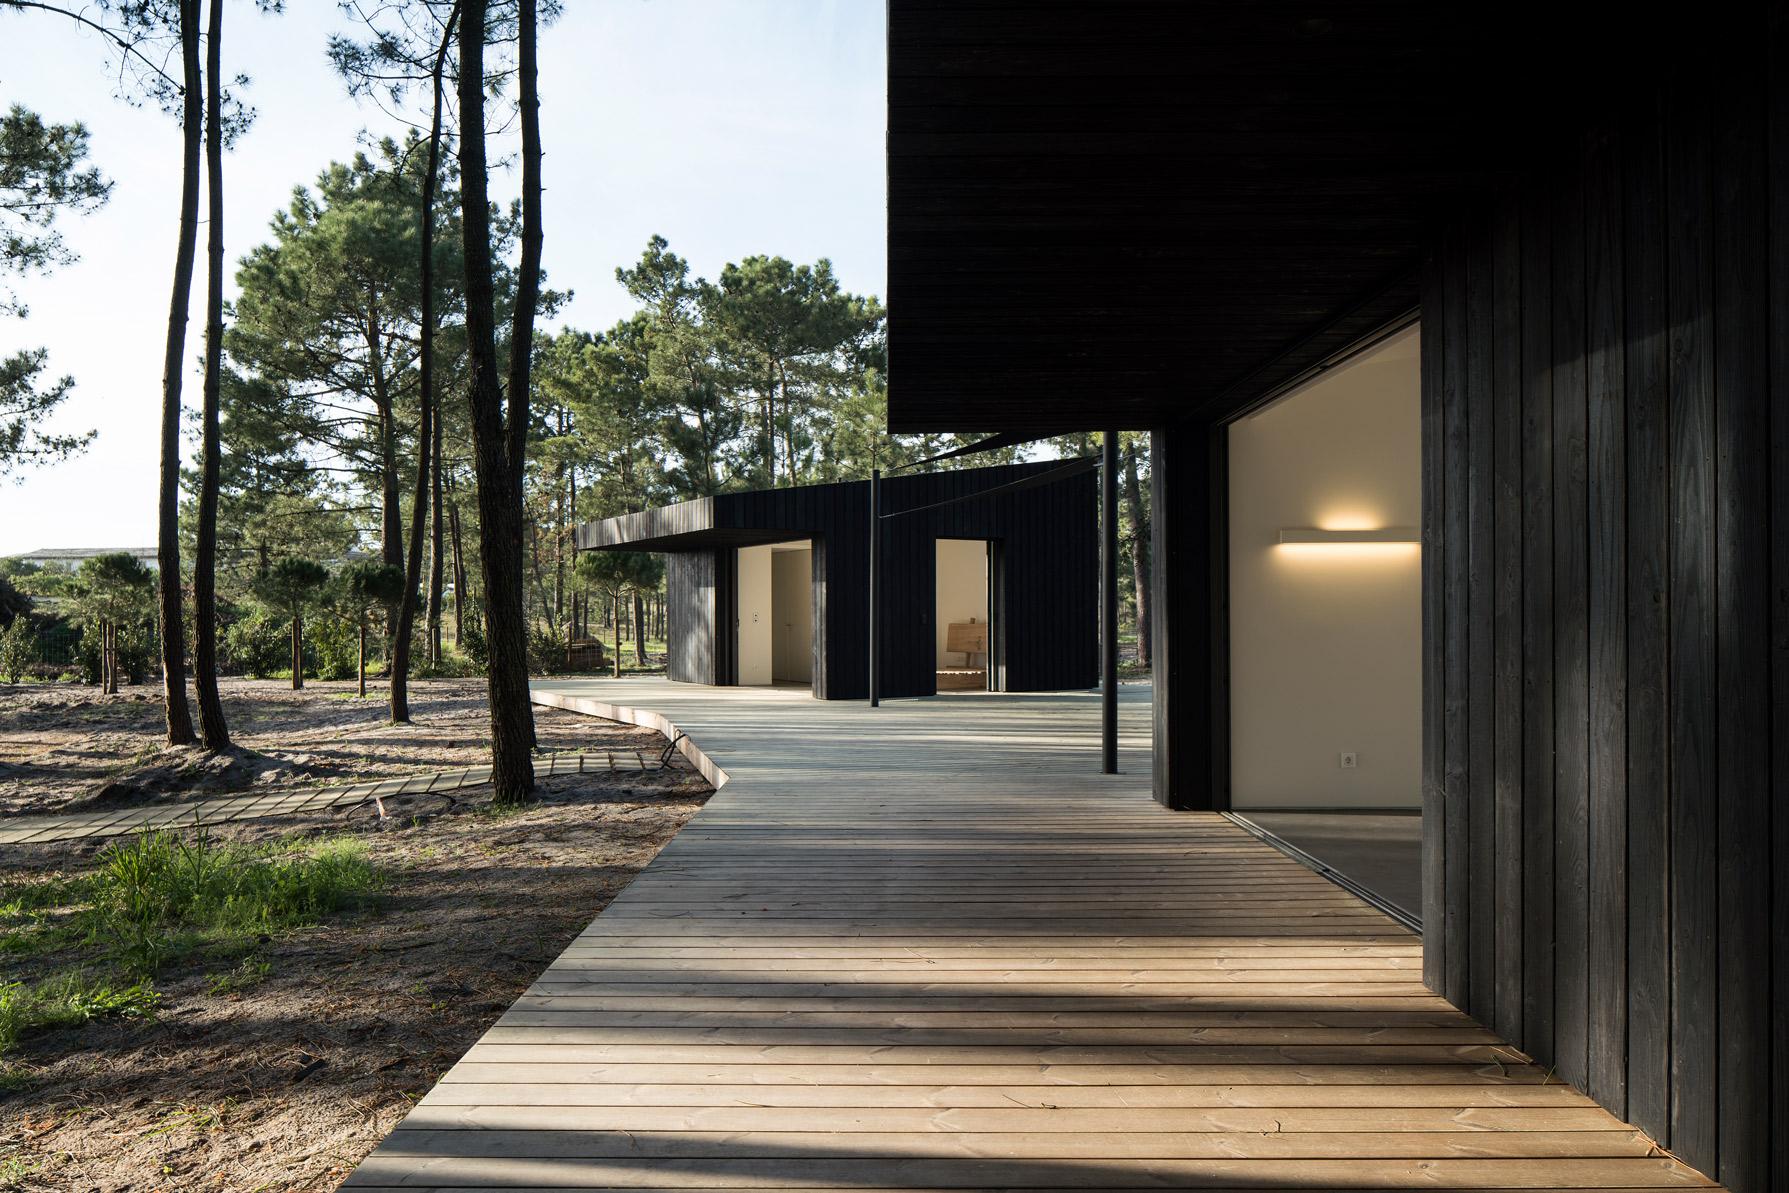 Studio 3A|Nelson Garrido